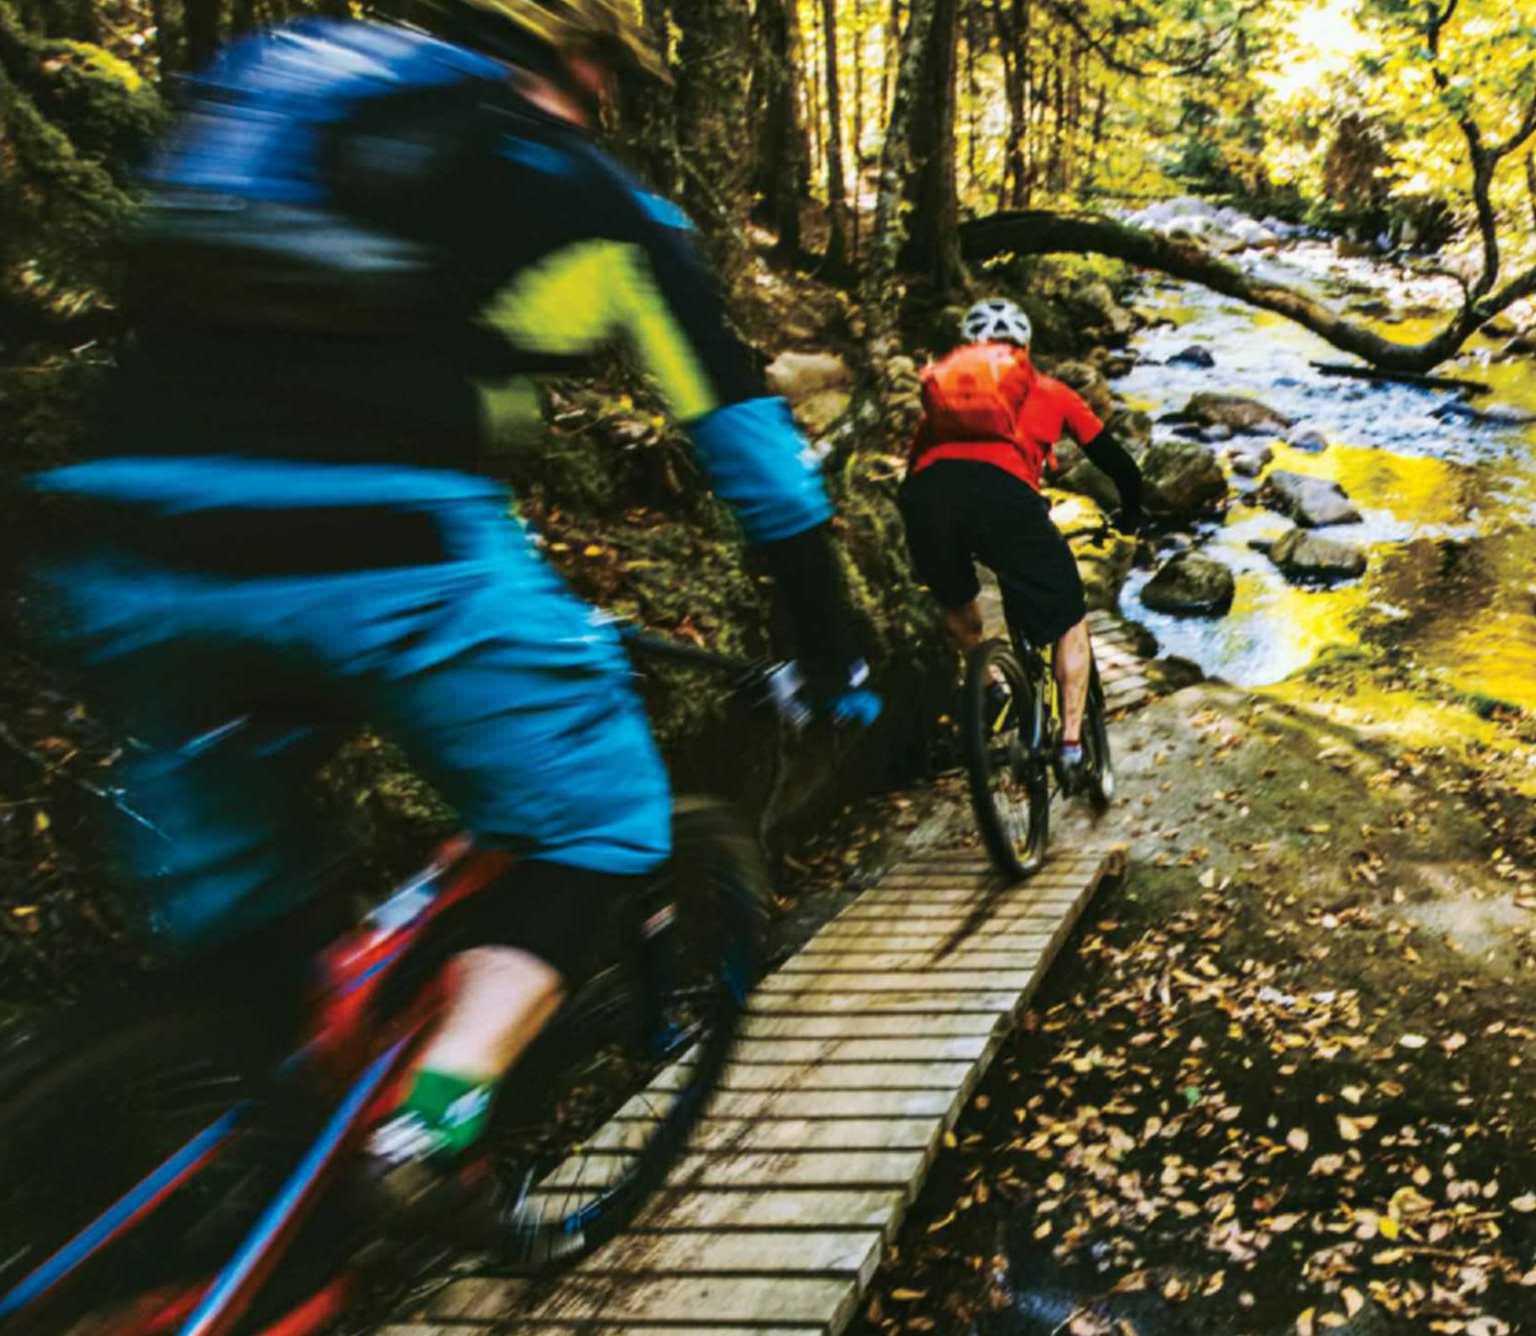 Quebec - Canada's Next Mountain Biking Powerhouse